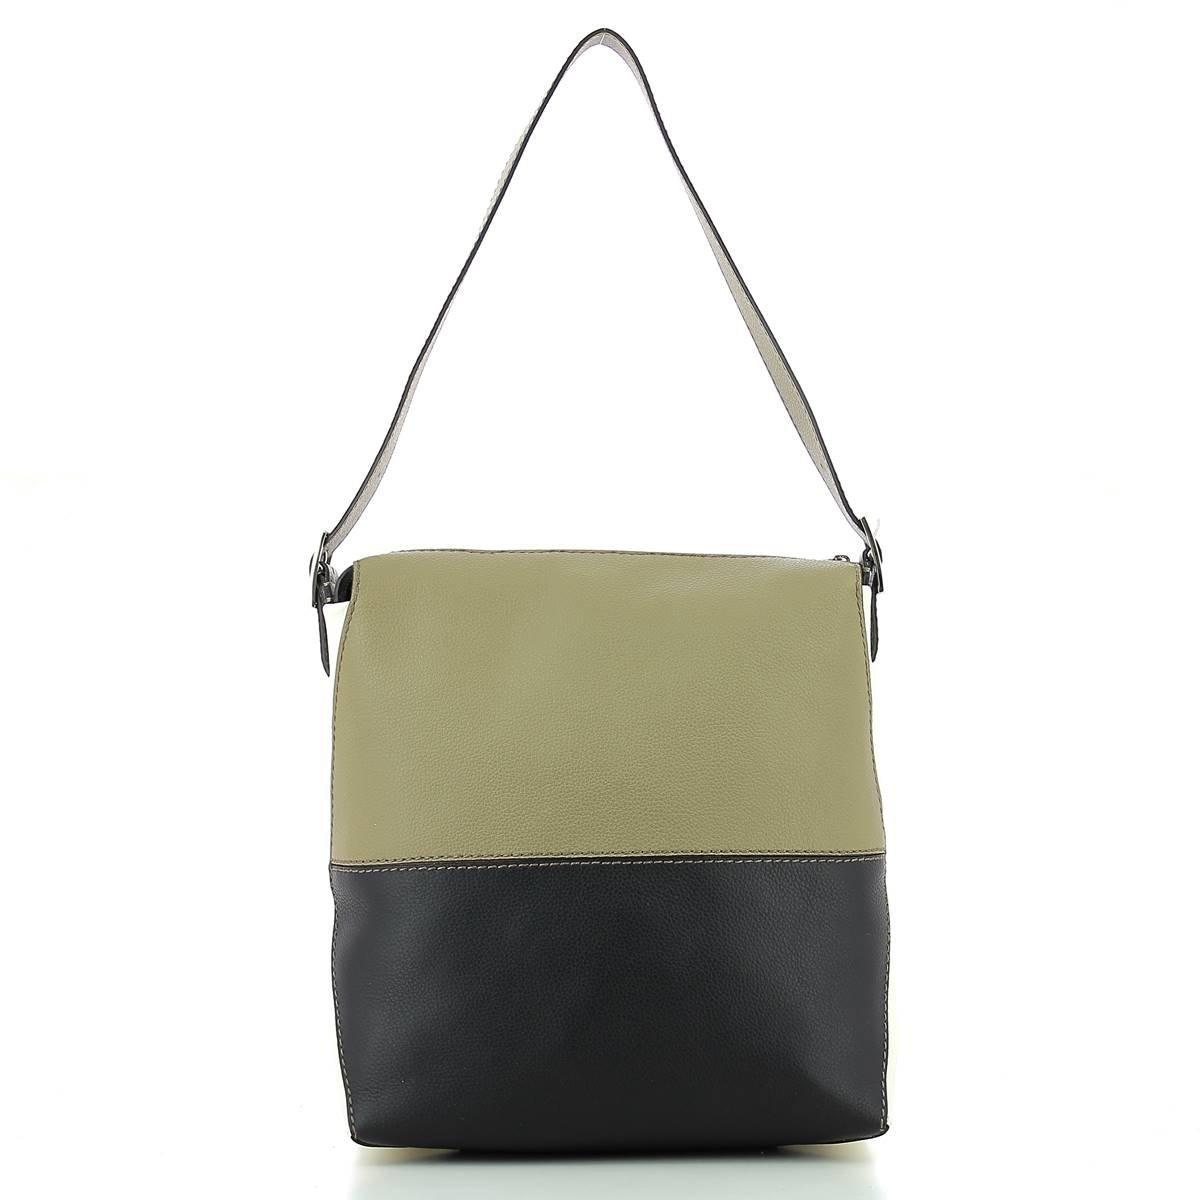 Furla Womens Dori Small Hobo Kaki Onyx Petalo Handbag Dome Authentic Shoes